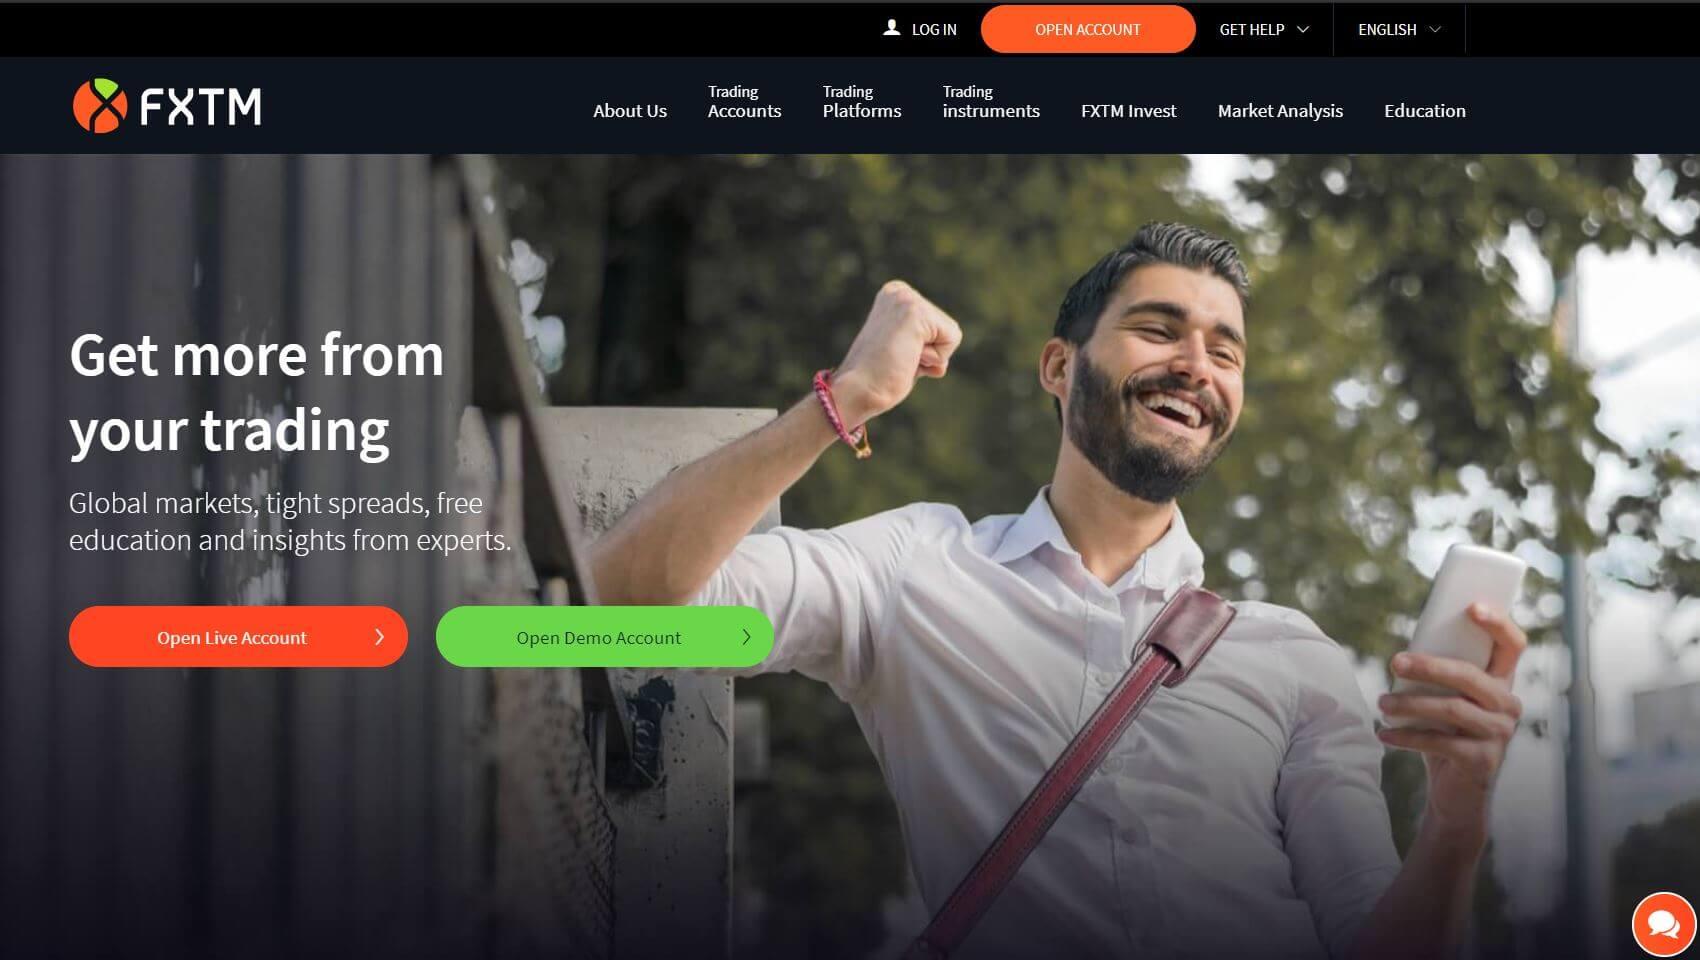 fxtm broker review homepage